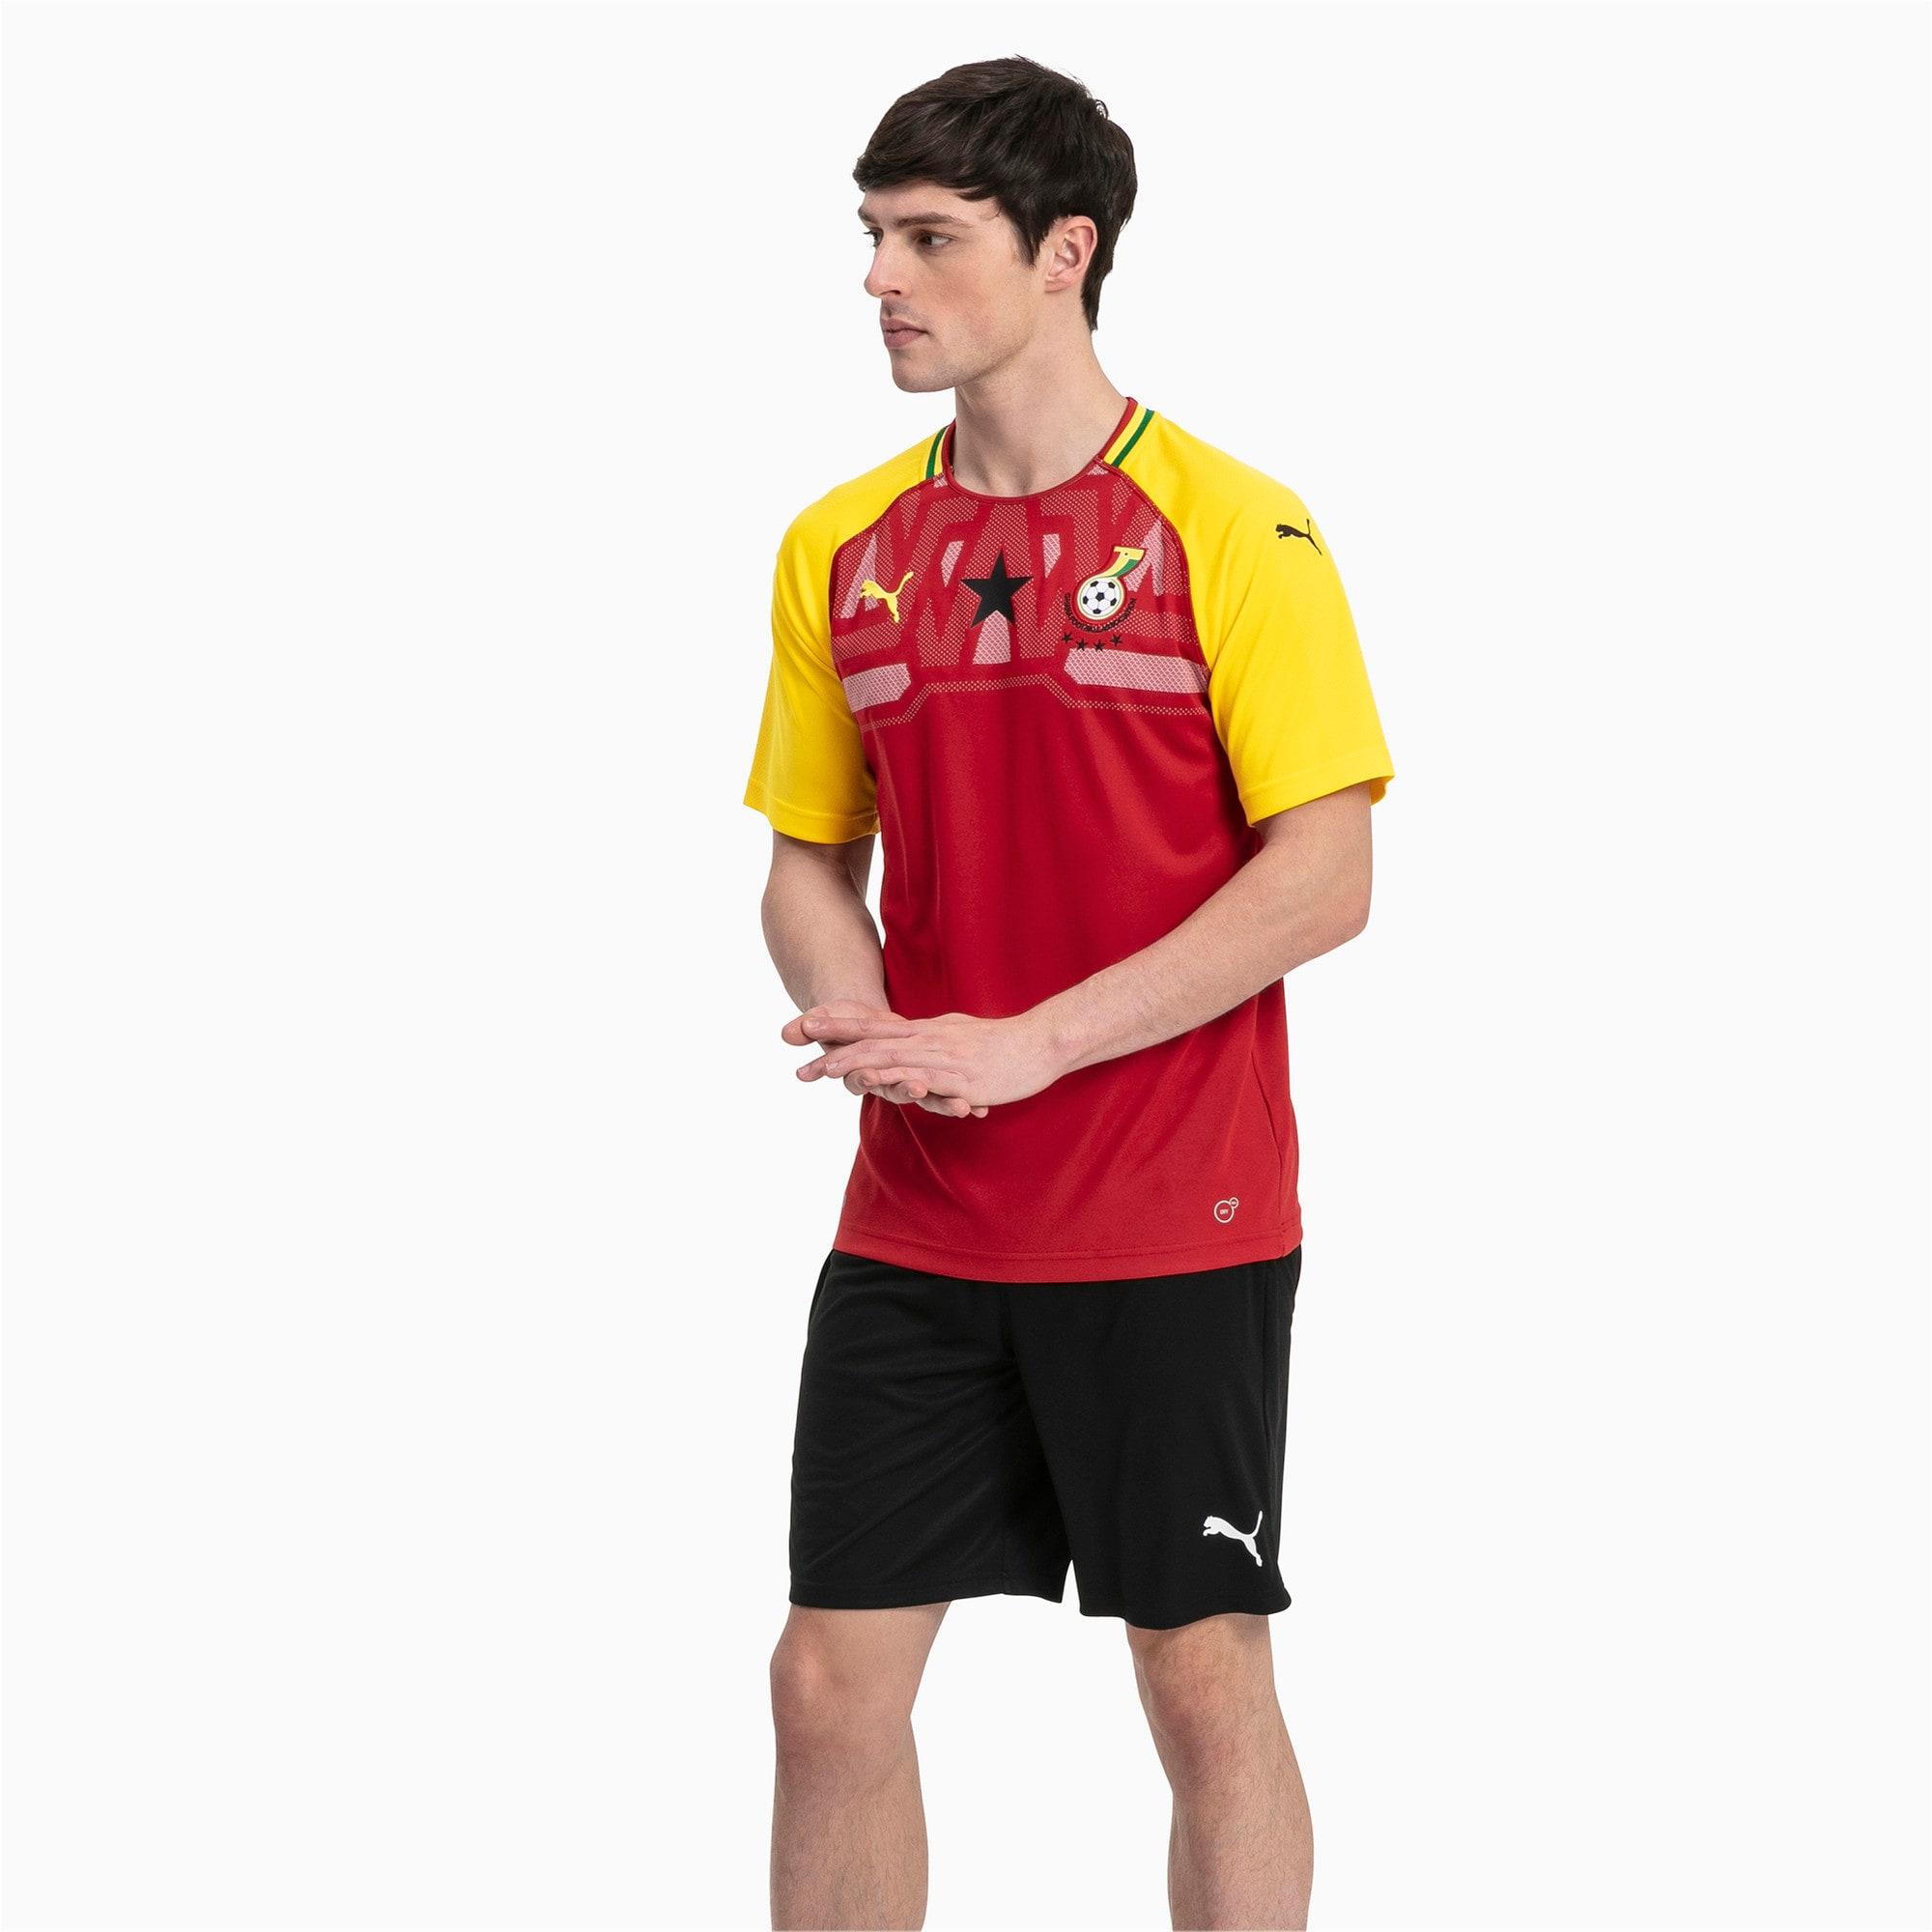 Thumbnail 3 of Liga Core Men's Shorts, Puma Black-Puma White, medium